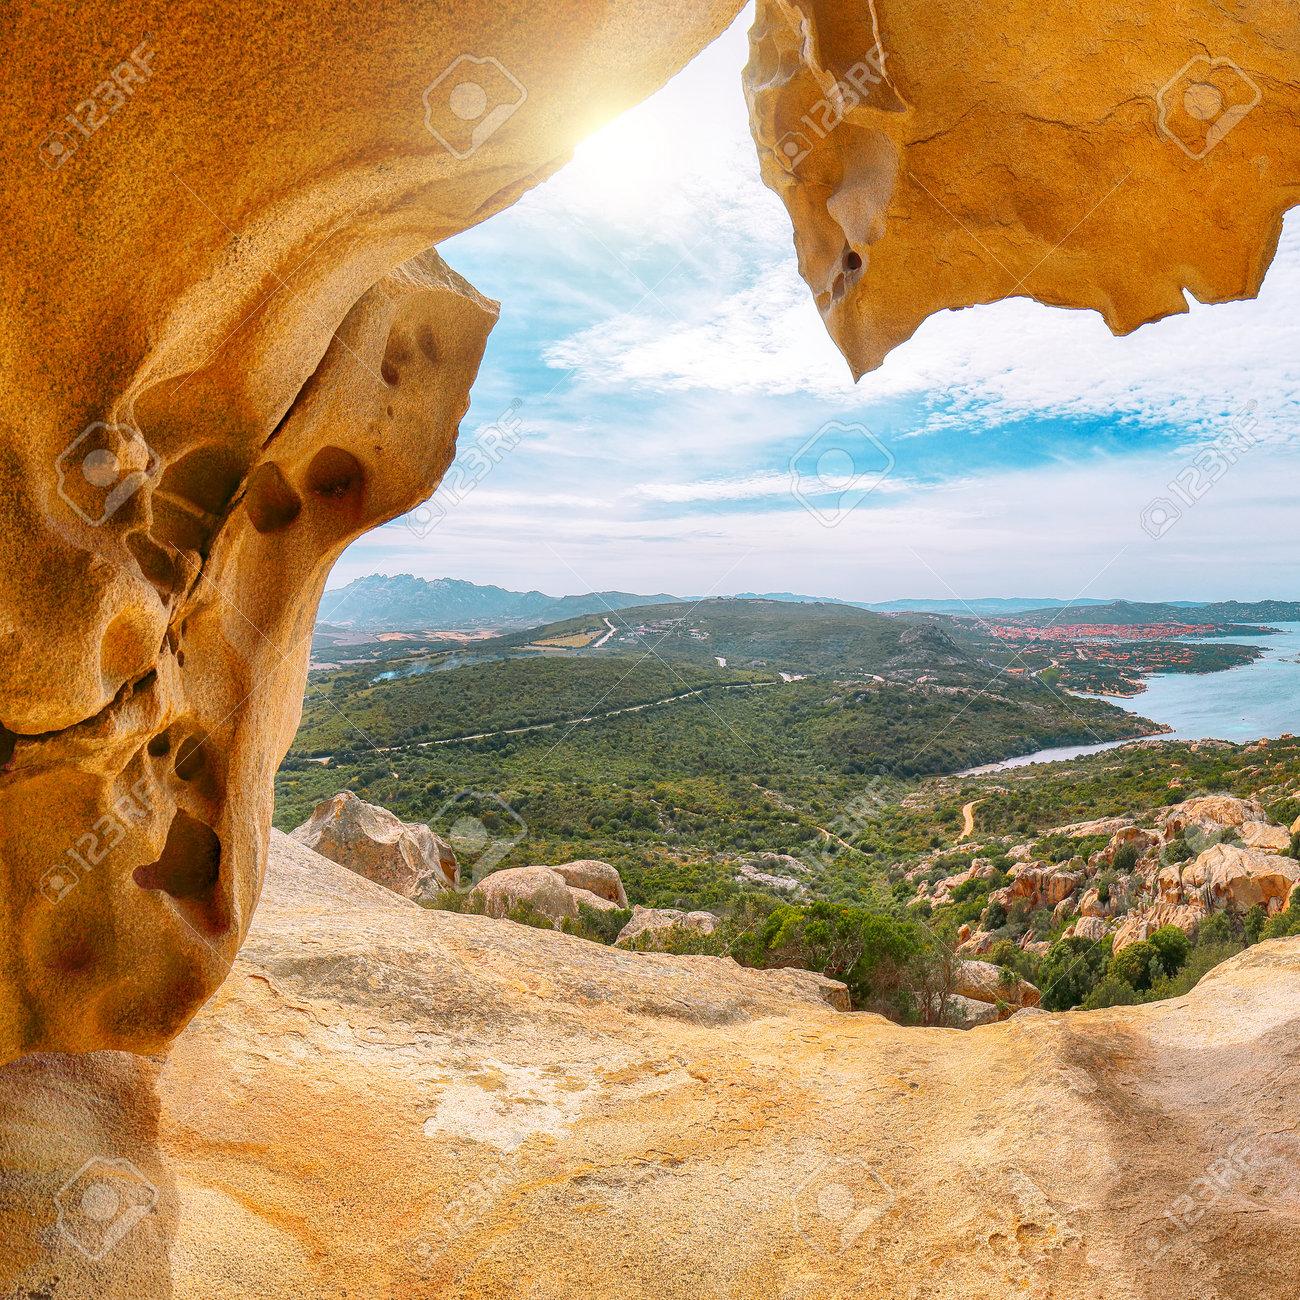 Fabulous view on Palau from popular travel destination Bear Rock (Roccia dell'Orso). Location: Palau, Province of Olbia-Tempio, Sardinia, Italy, Europe - 170378777